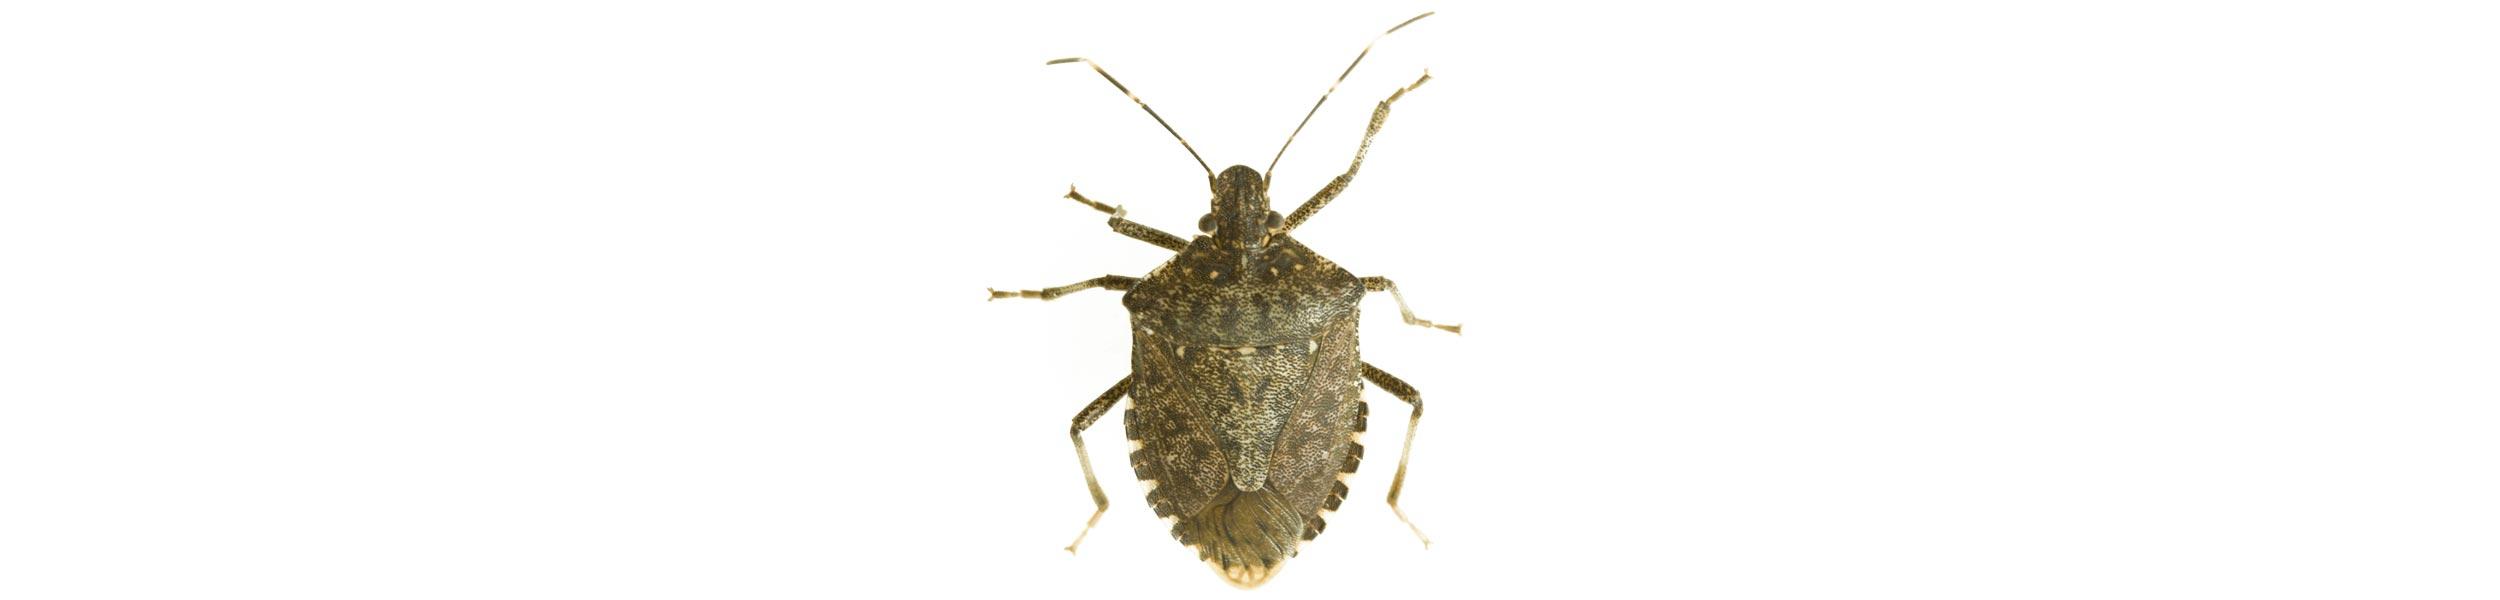 ACE Exterminating-Pest-Control-Stink-Bug-Header